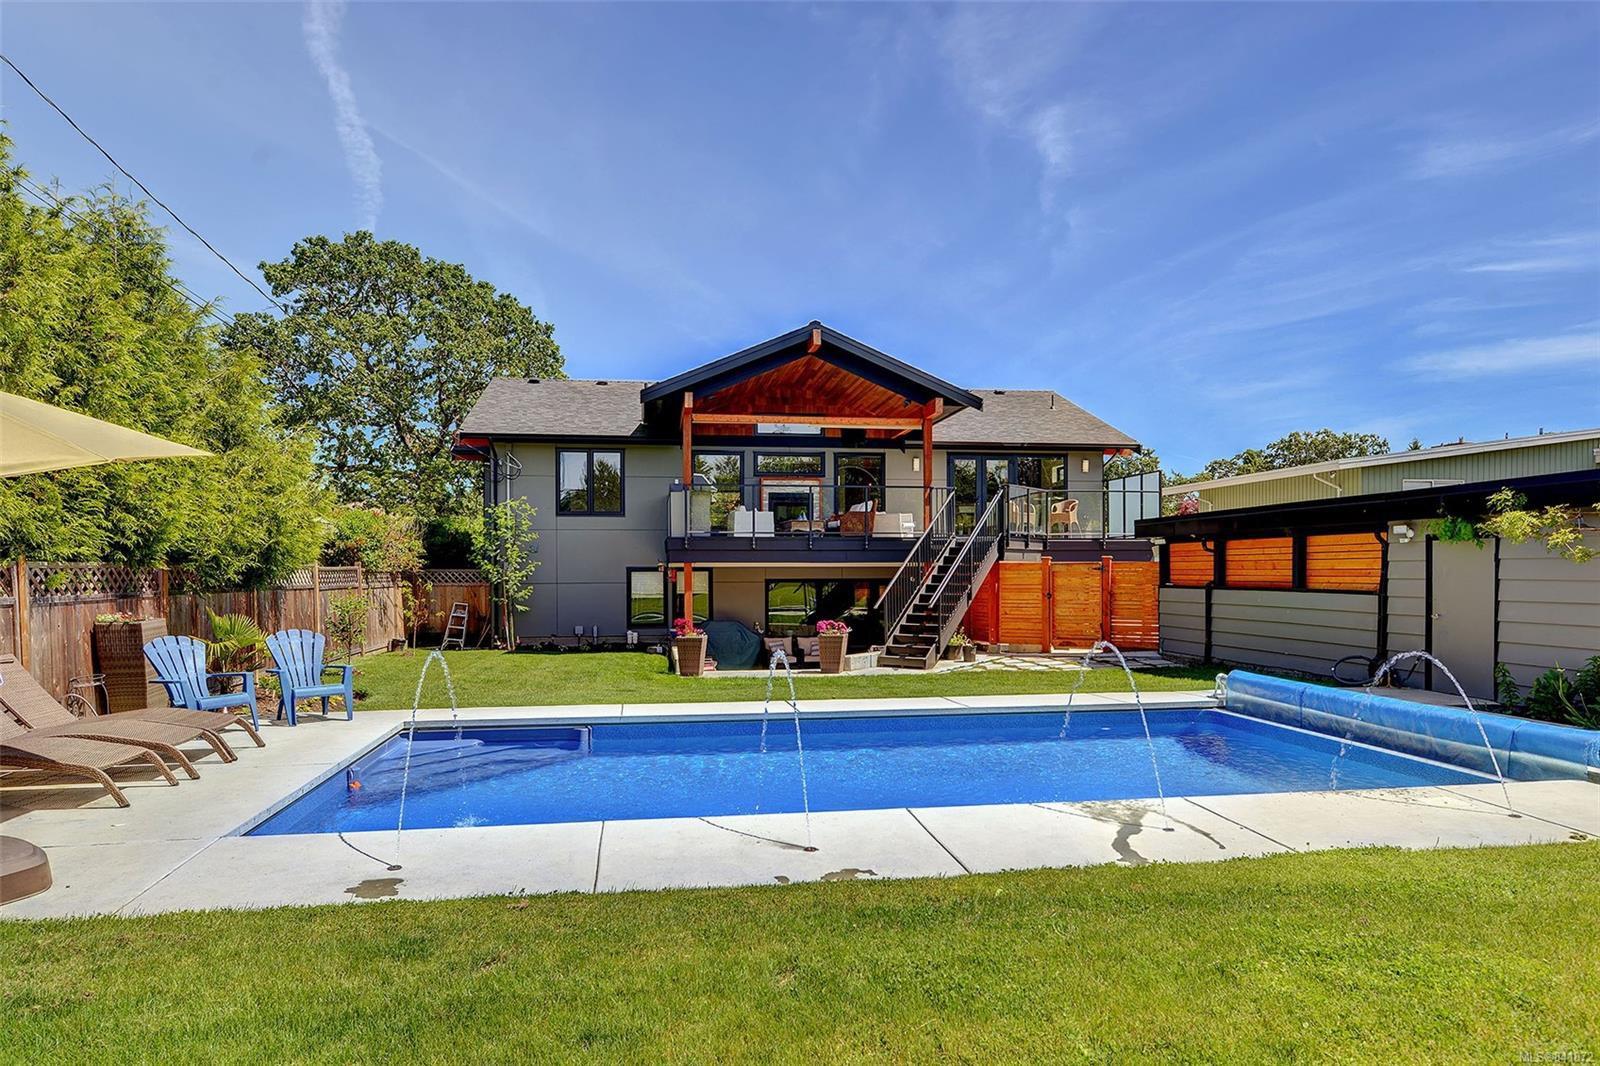 Main Photo: 3420 Woodburn Ave in Oak Bay: OB Henderson Single Family Detached for sale : MLS®# 841872